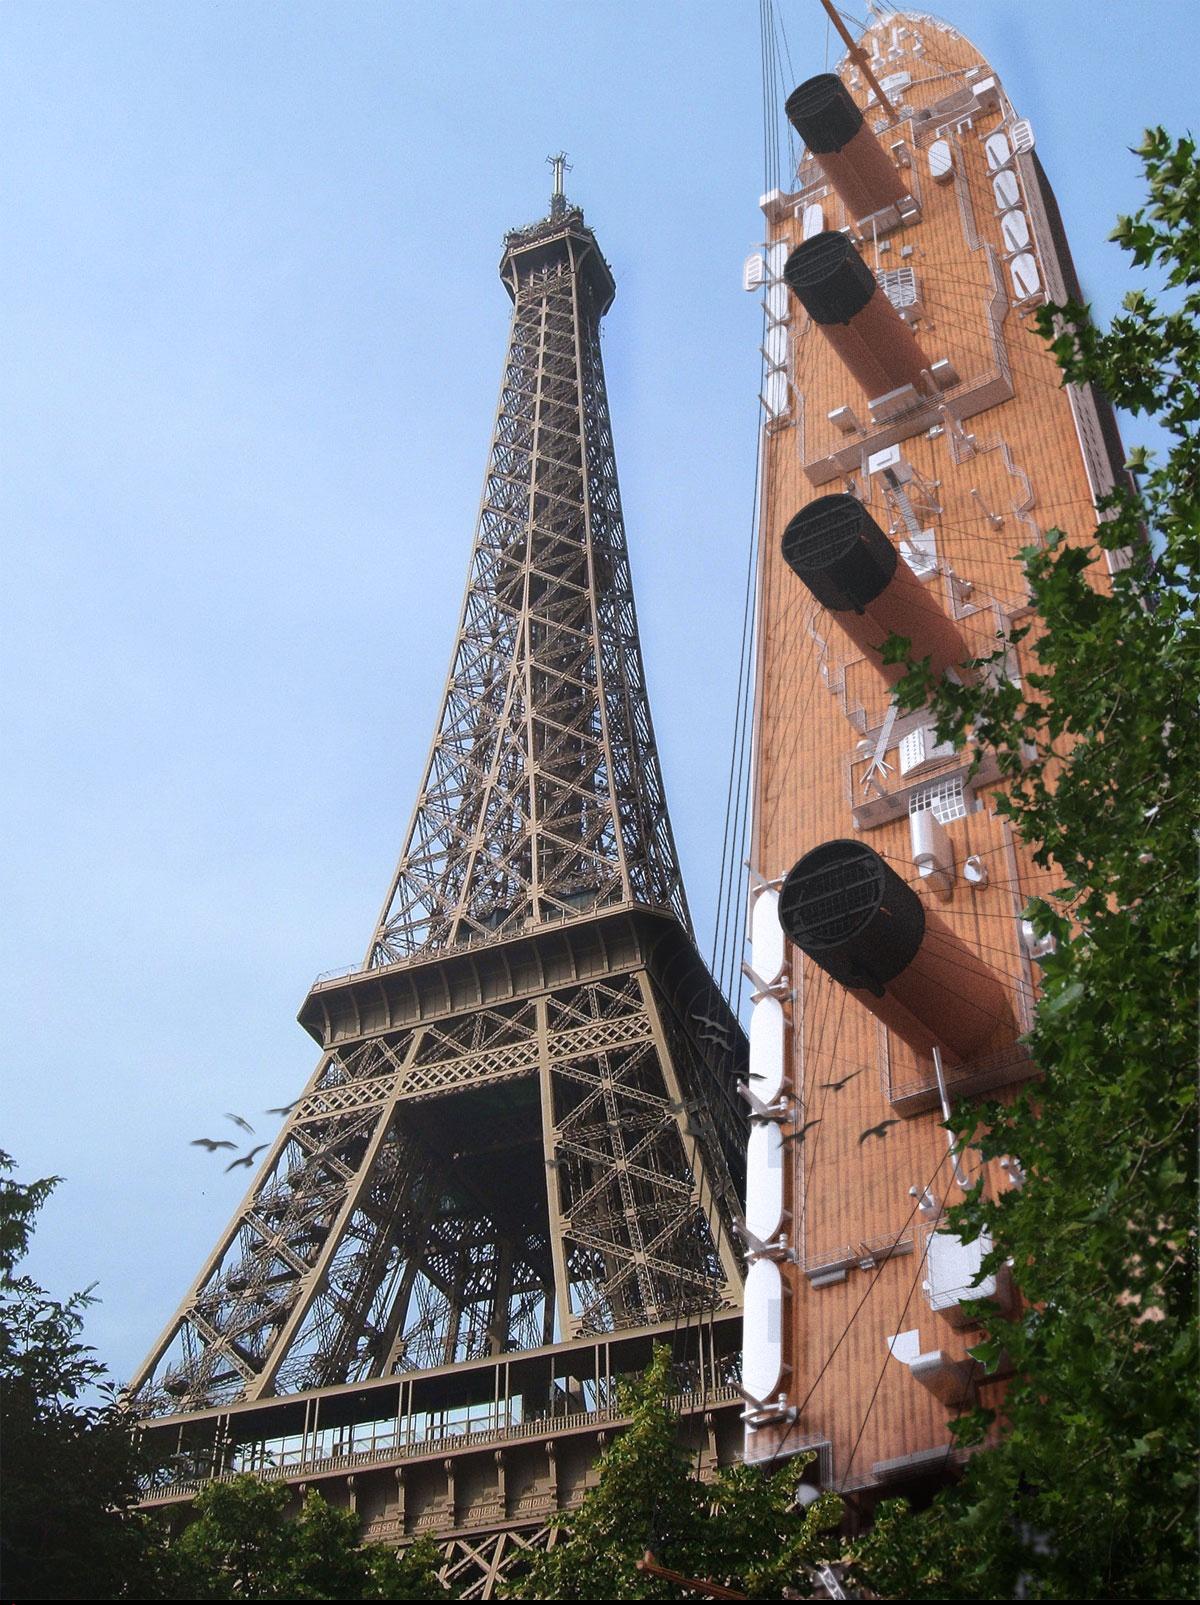 Titanic on vacation, Paris by Ben Althoff